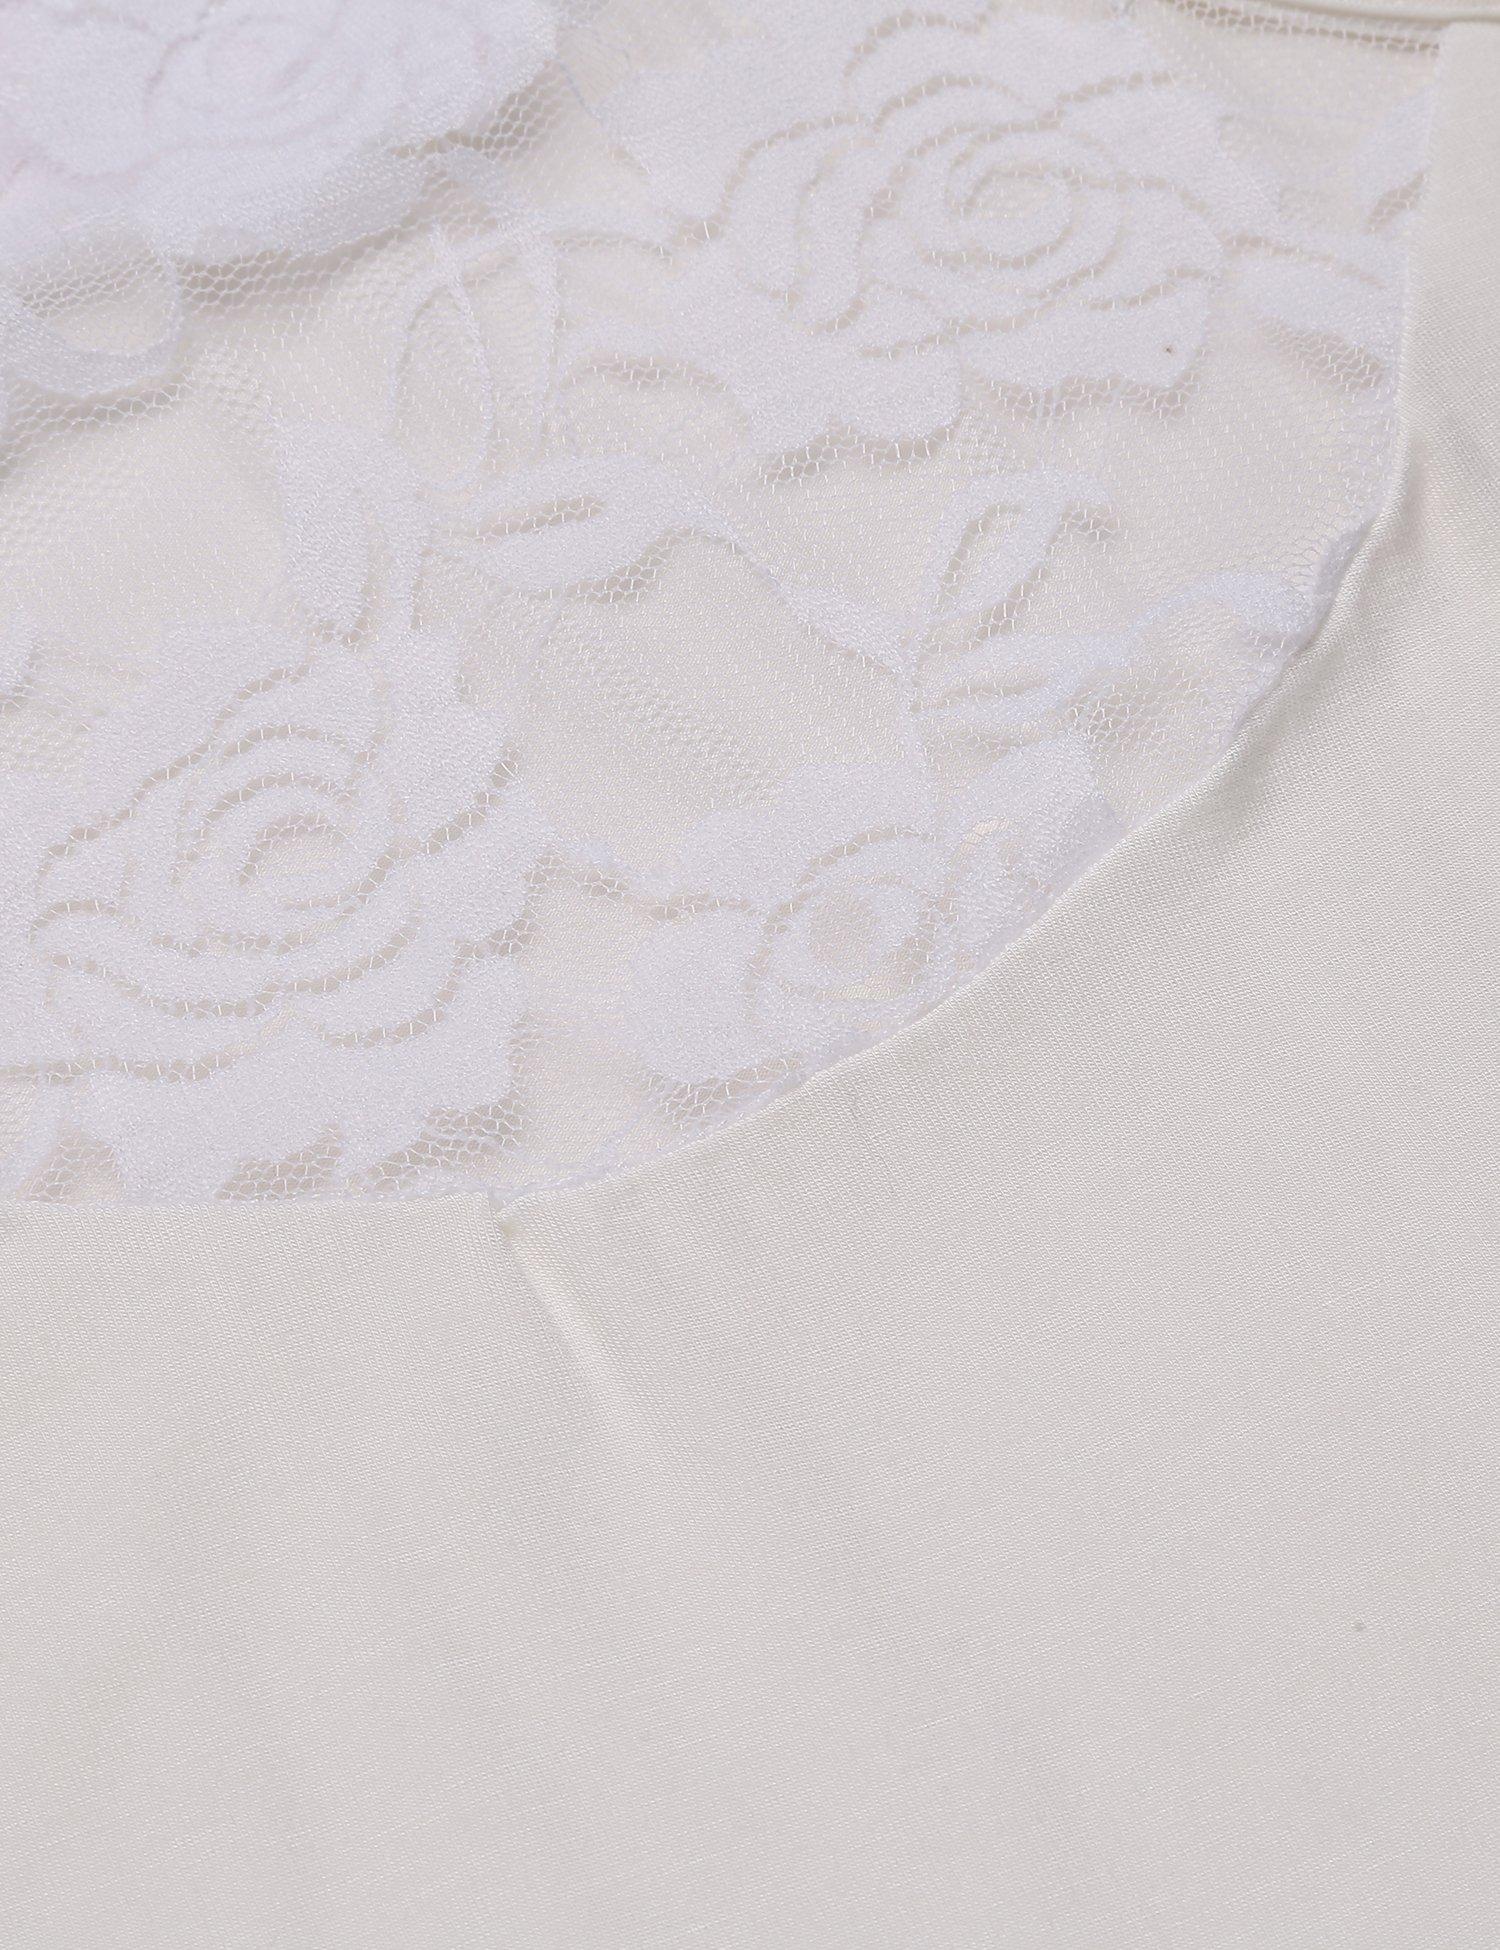 Mofavor Women's Sleeveless Crochet Lace Camisole Vest Halter Racerback Tank Top,White,Large by Mofavor (Image #6)